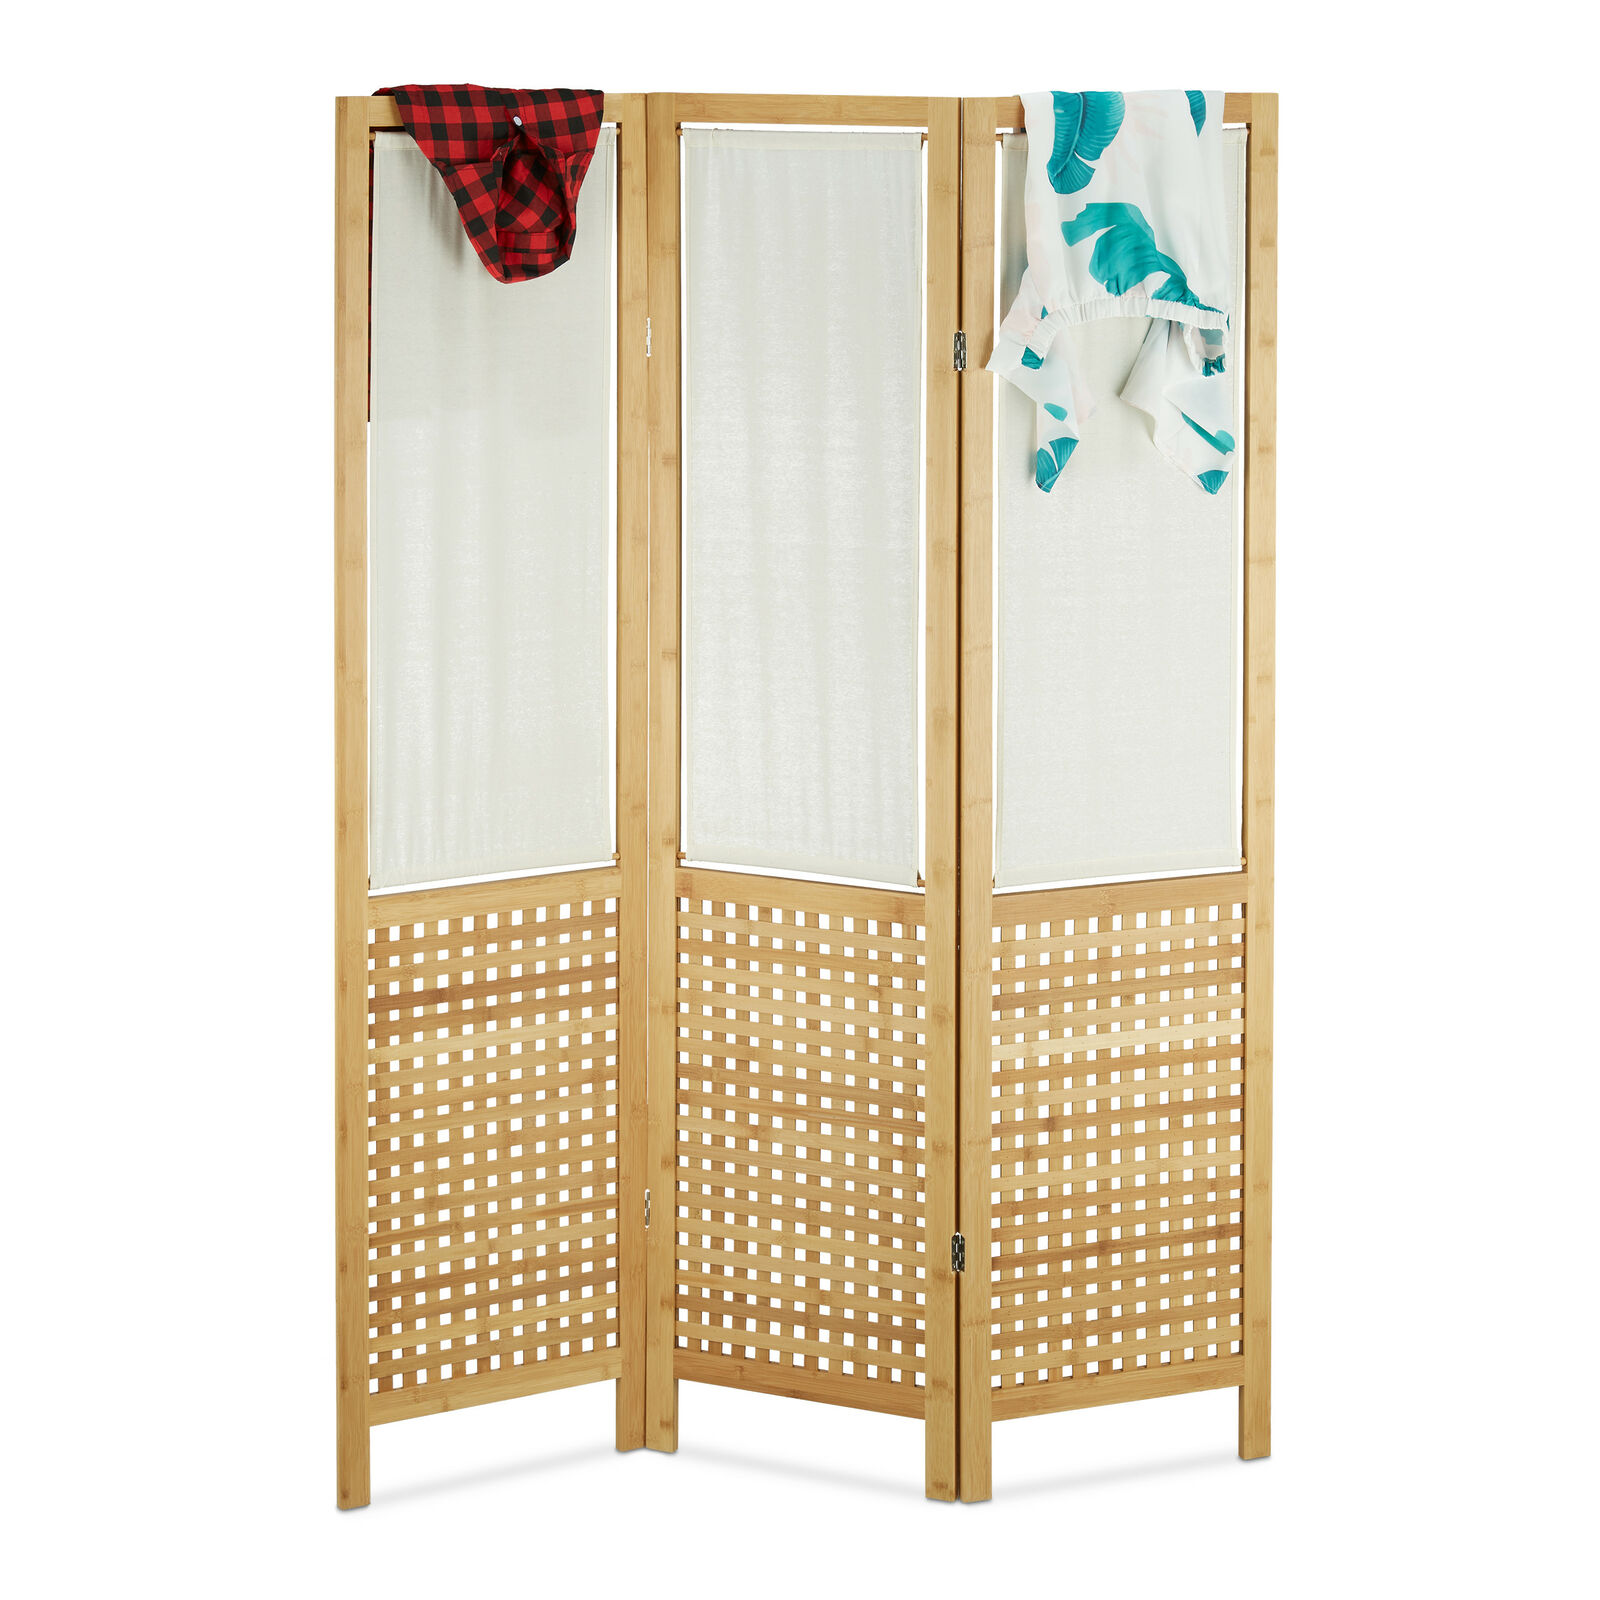 Full Size of Paravent Bambus Raumtrenner Spanische Wand Trennwand 4 Teilig 180 Garten Bett Wohnzimmer Paravent Bambus